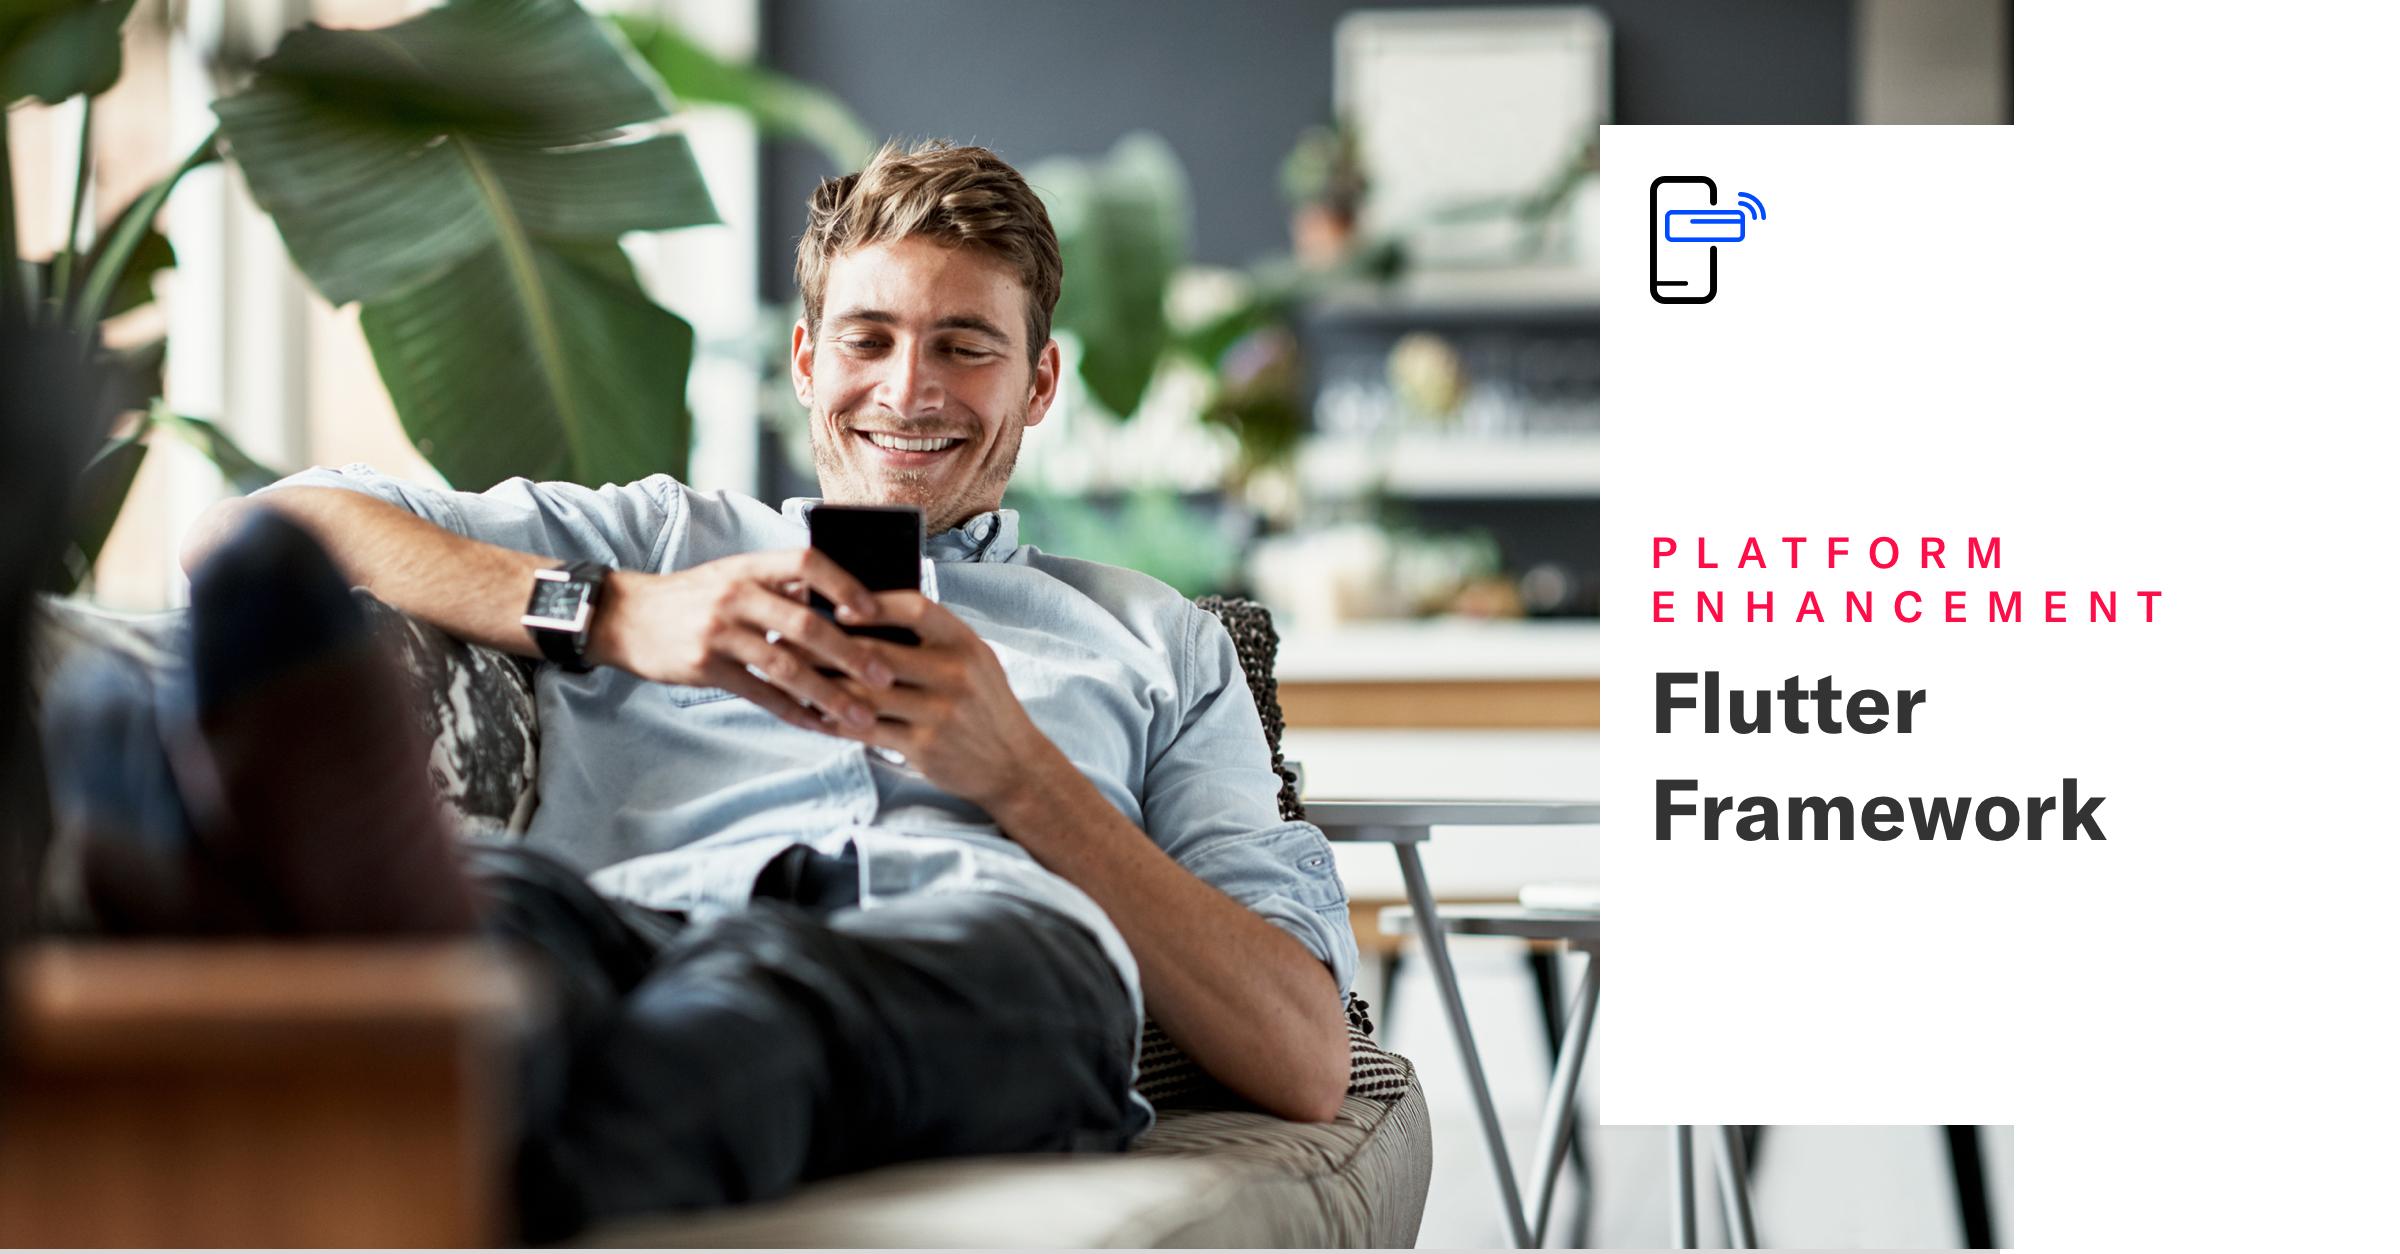 Flutter Framework Support